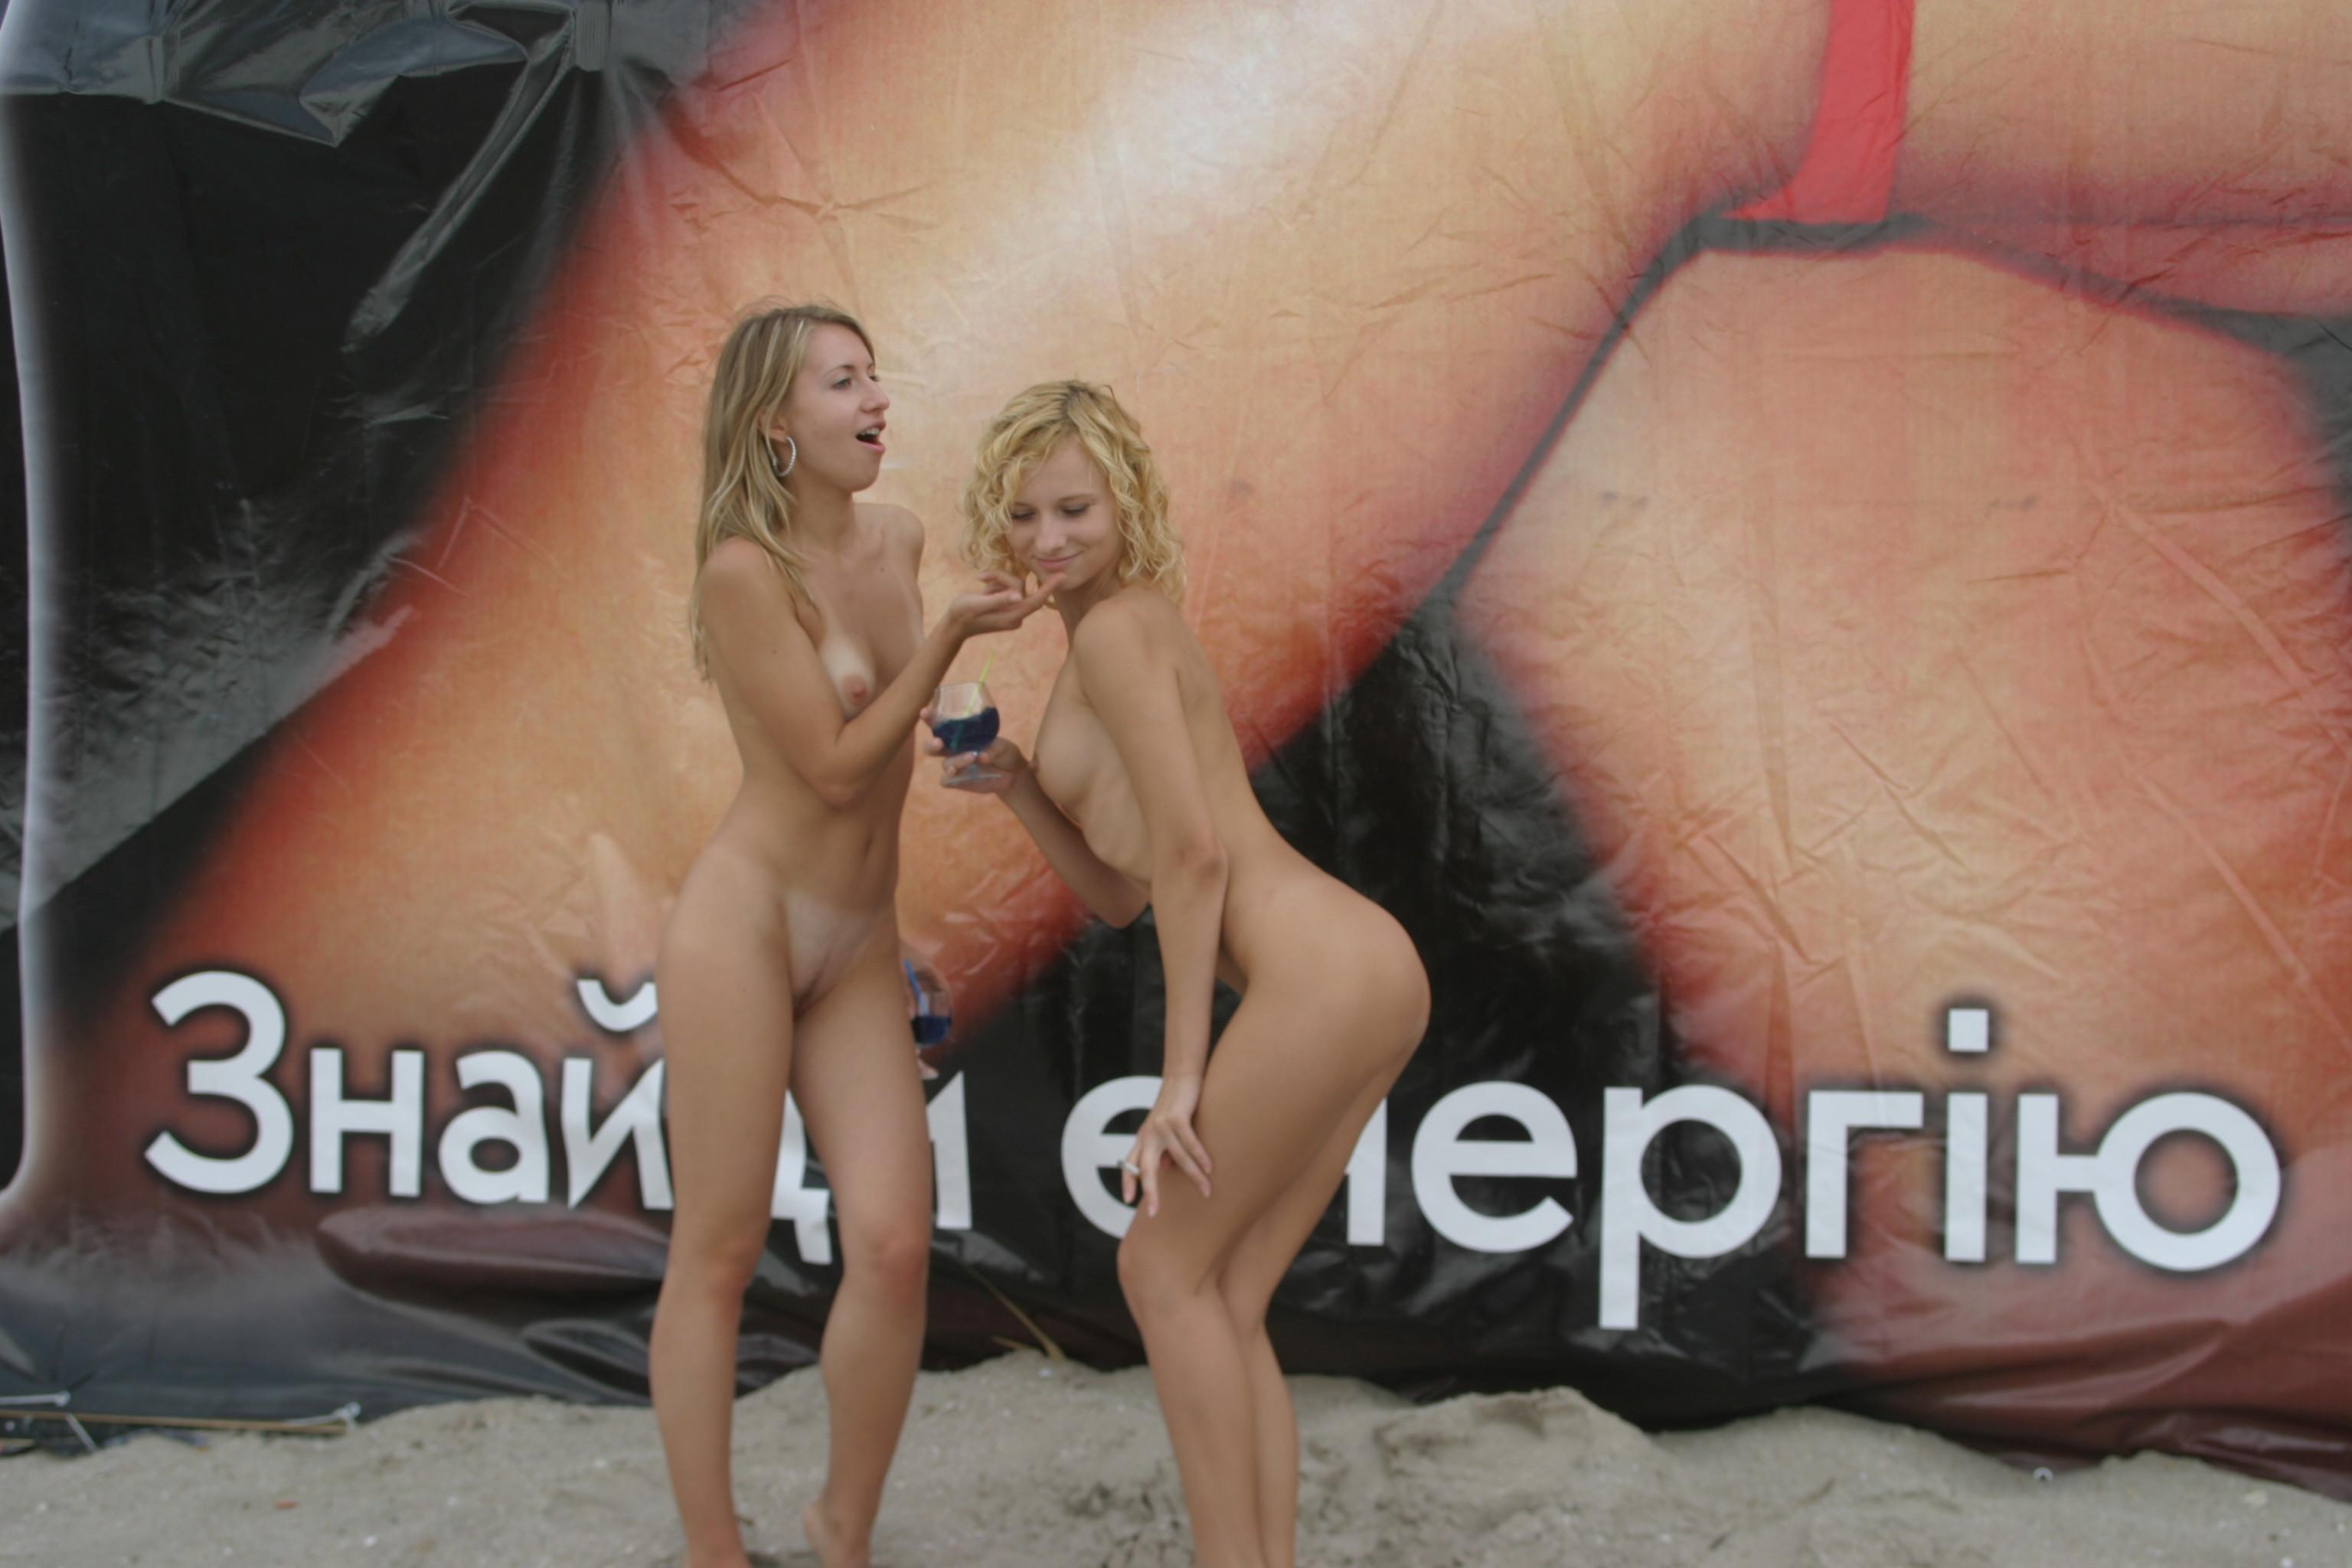 vika-y-lena-l-beach-nude-in-public-metart-53